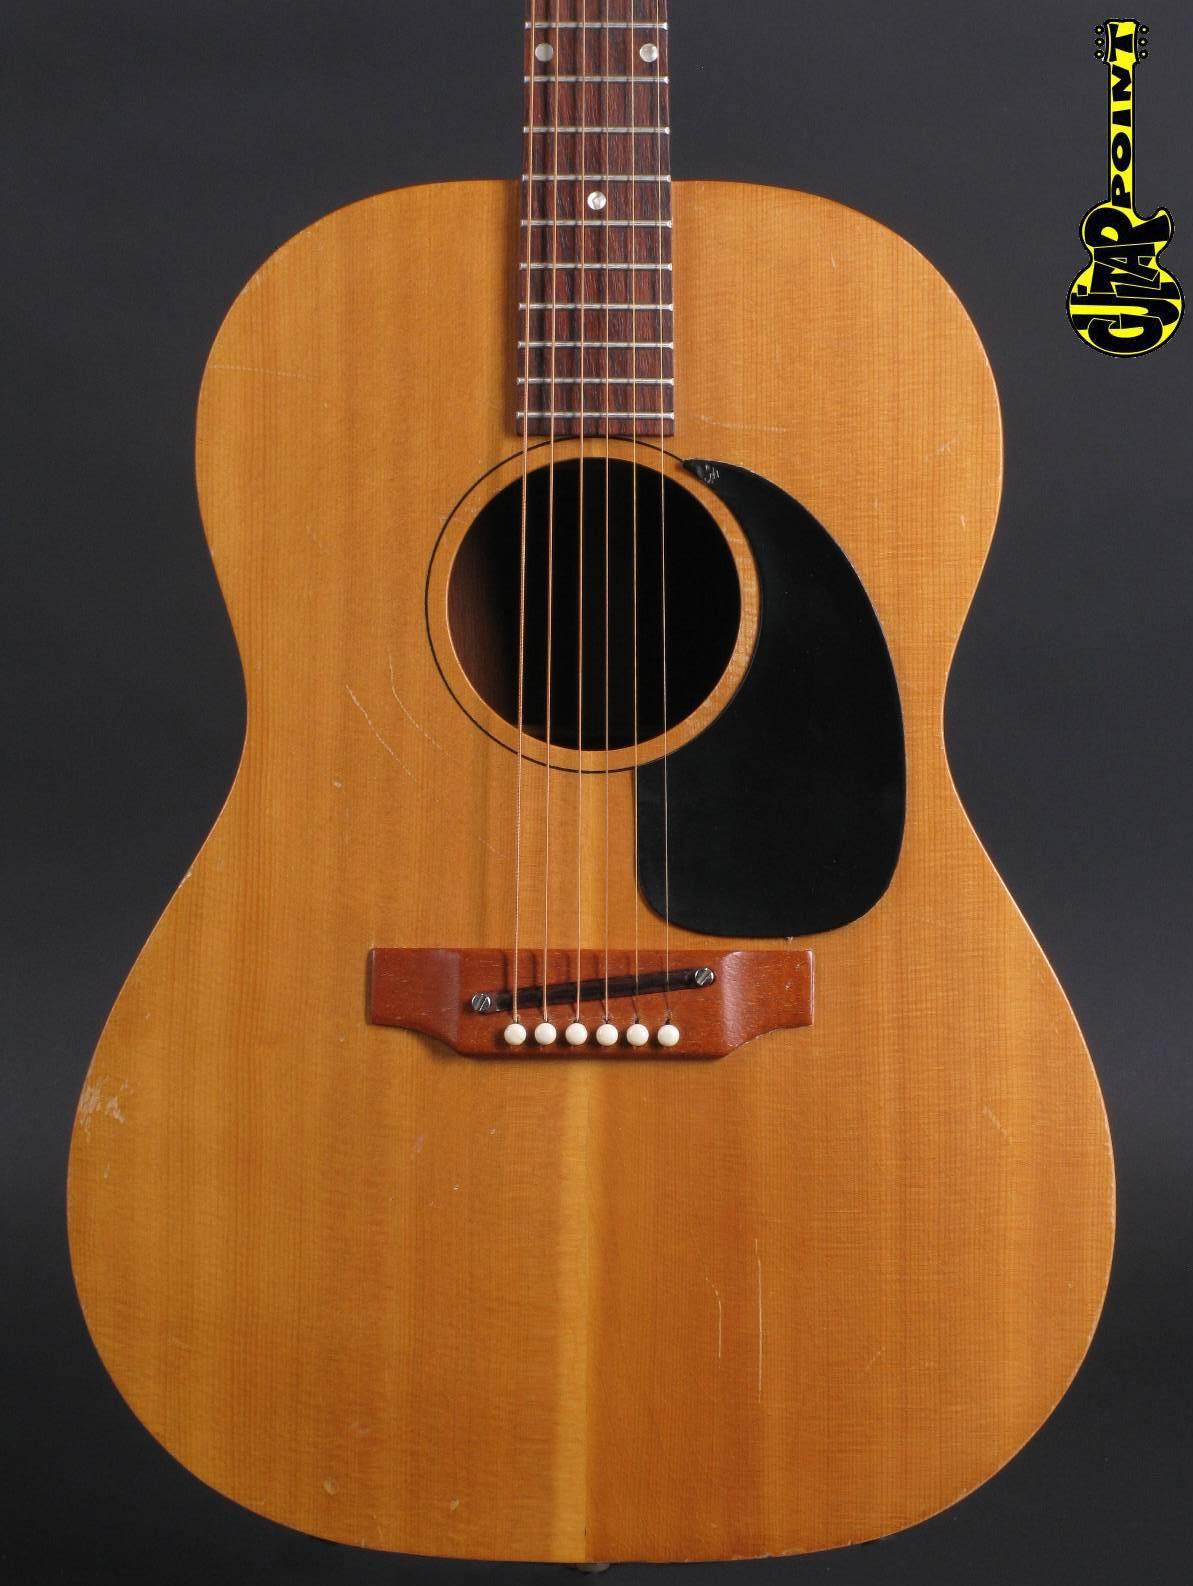 1967 Gibson B-15 - Natural